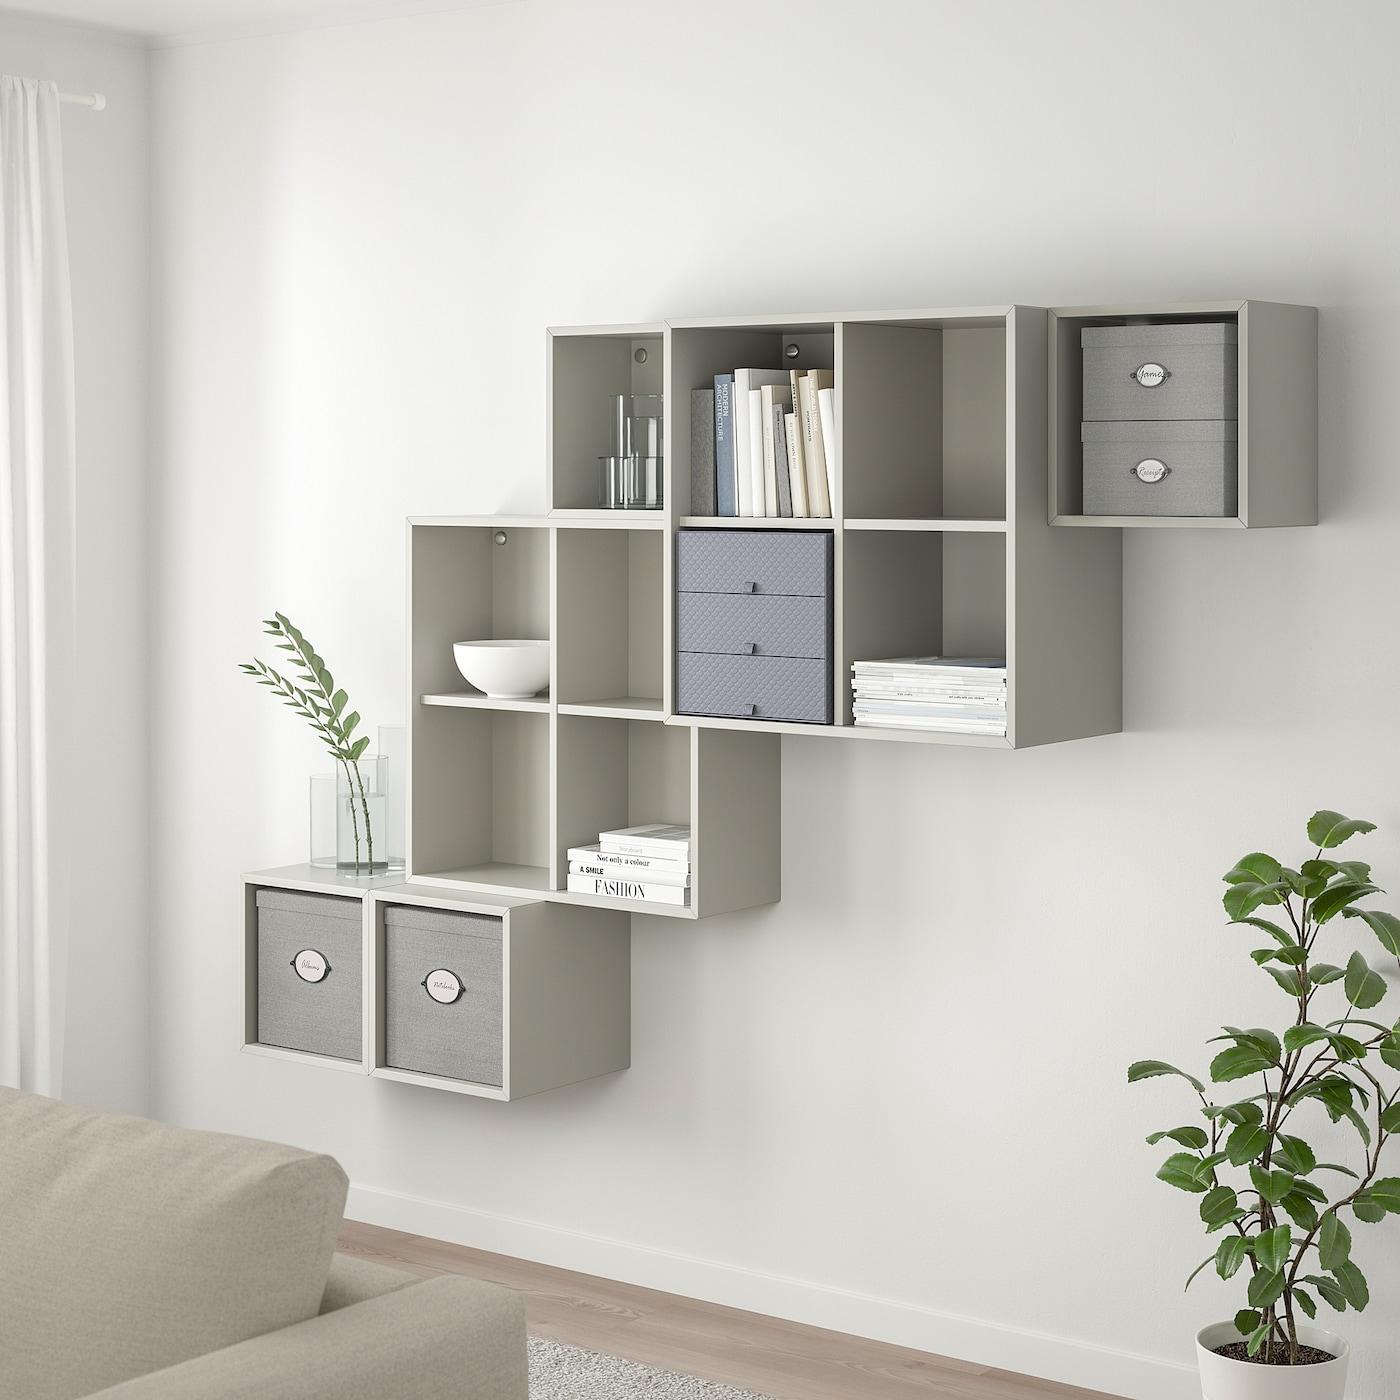 KVARNVIK Estalkidun kaxa, grisa, 18x25x15 cm